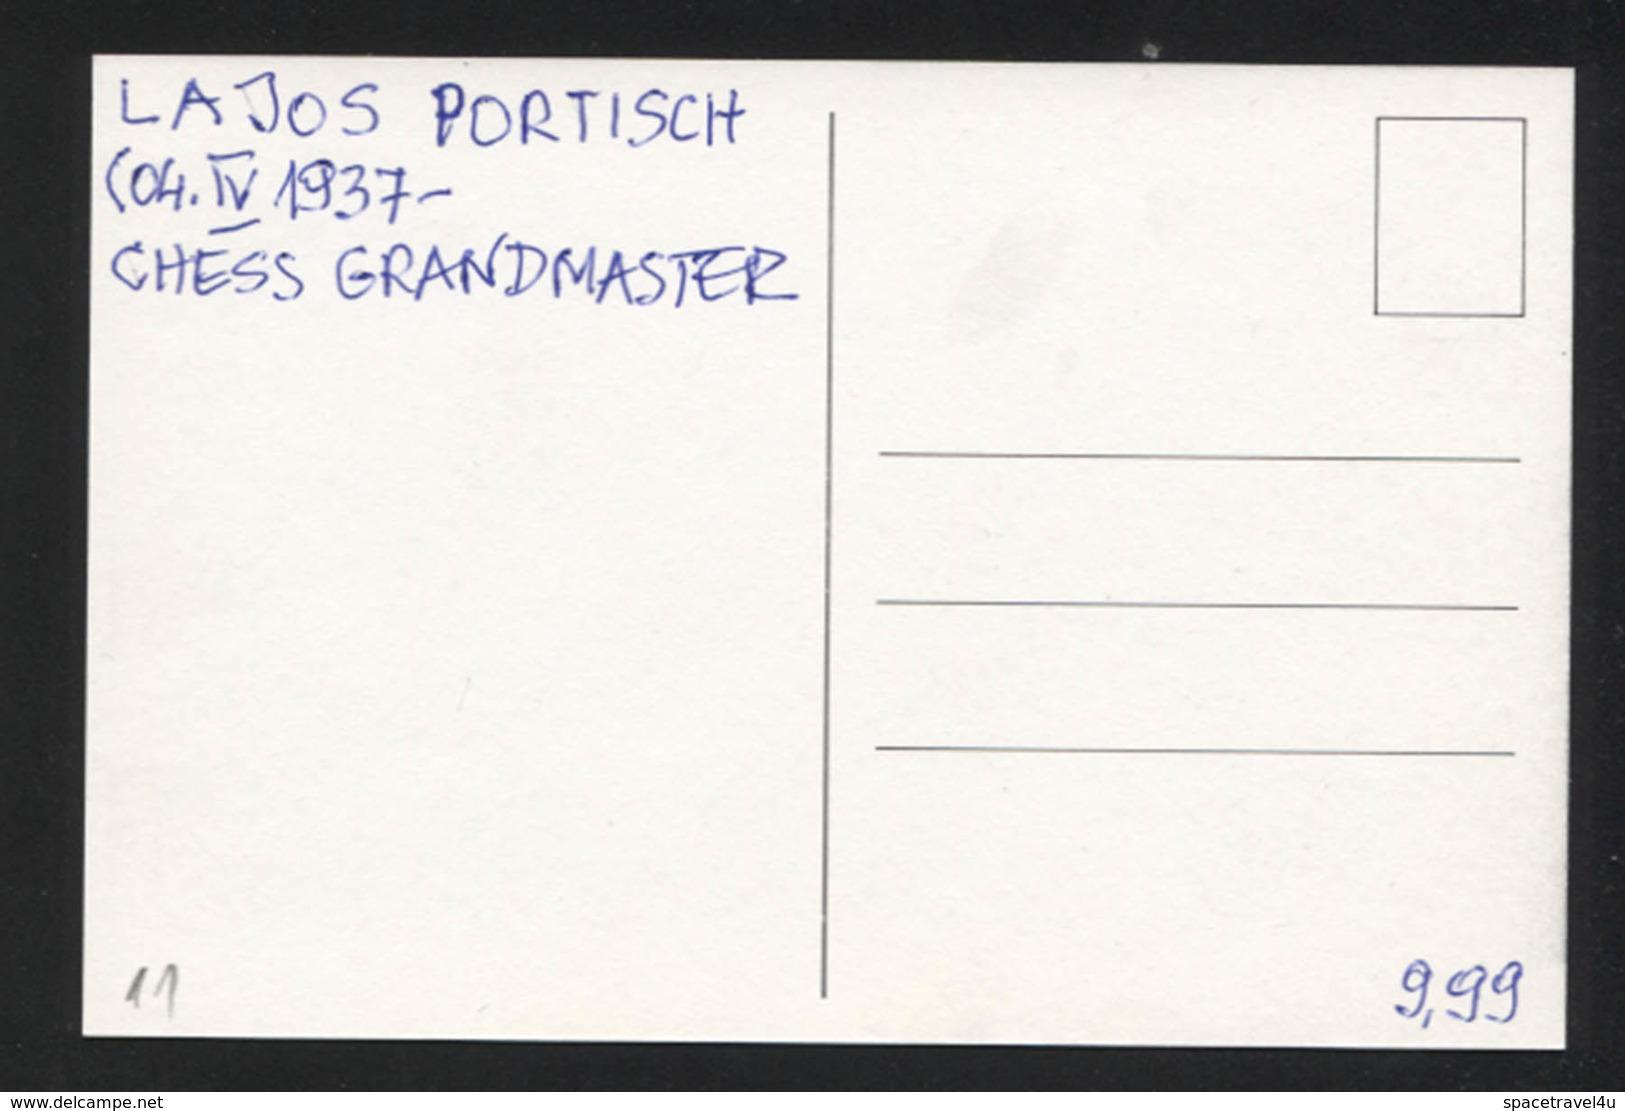 Lajos Portisch - Hungarian Chess Grandmaster -  Postcard - (CHESS-11) - Cartes Postales